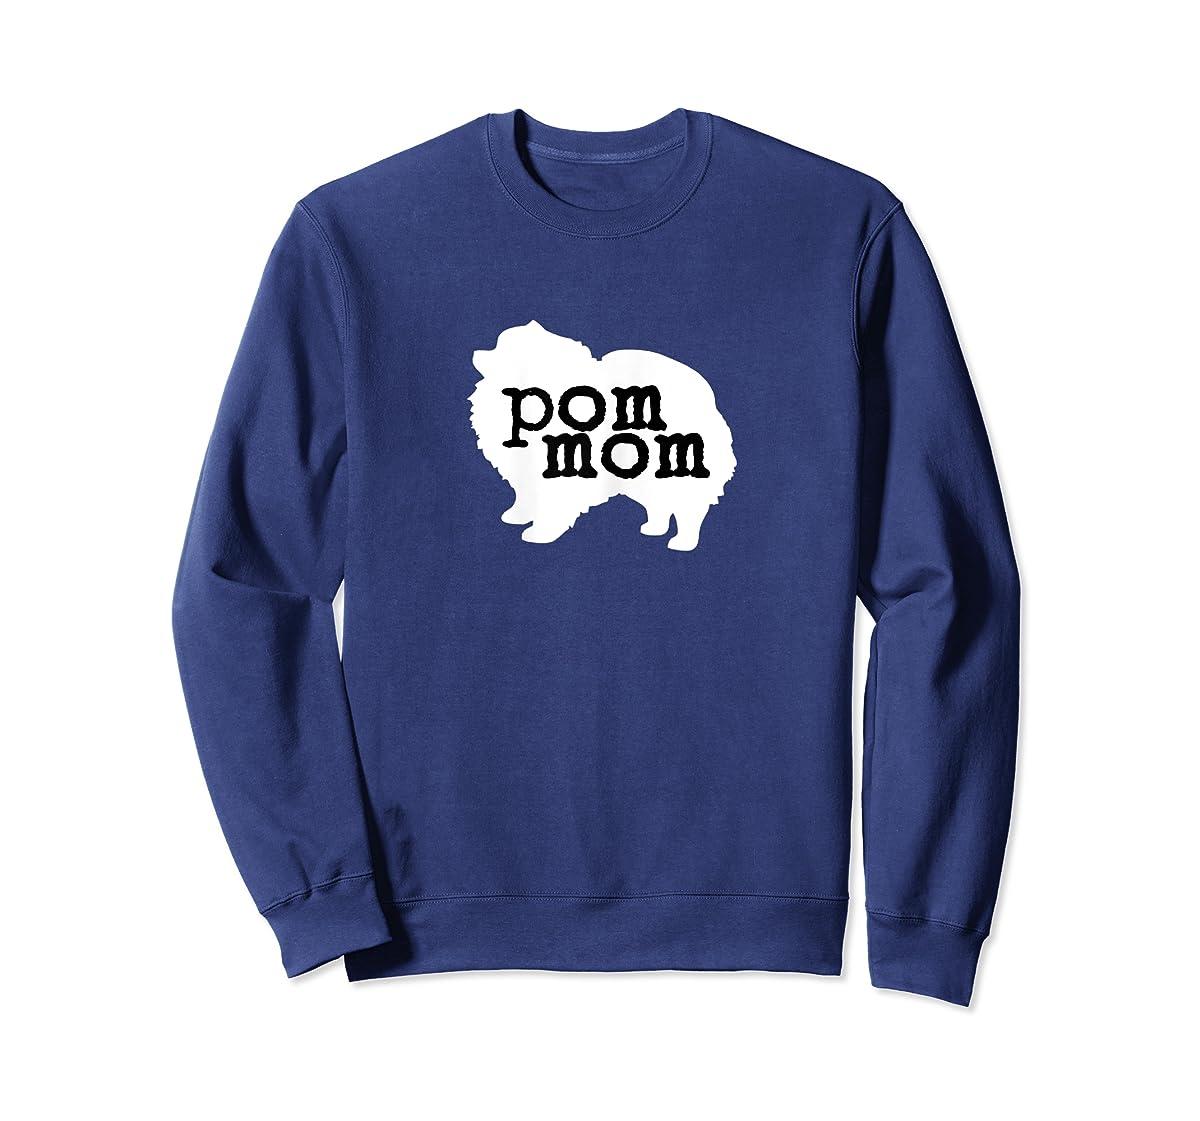 Womens Pomeranian Dog Lover Pom Mom T Shirt-Sweatshirt-Navy